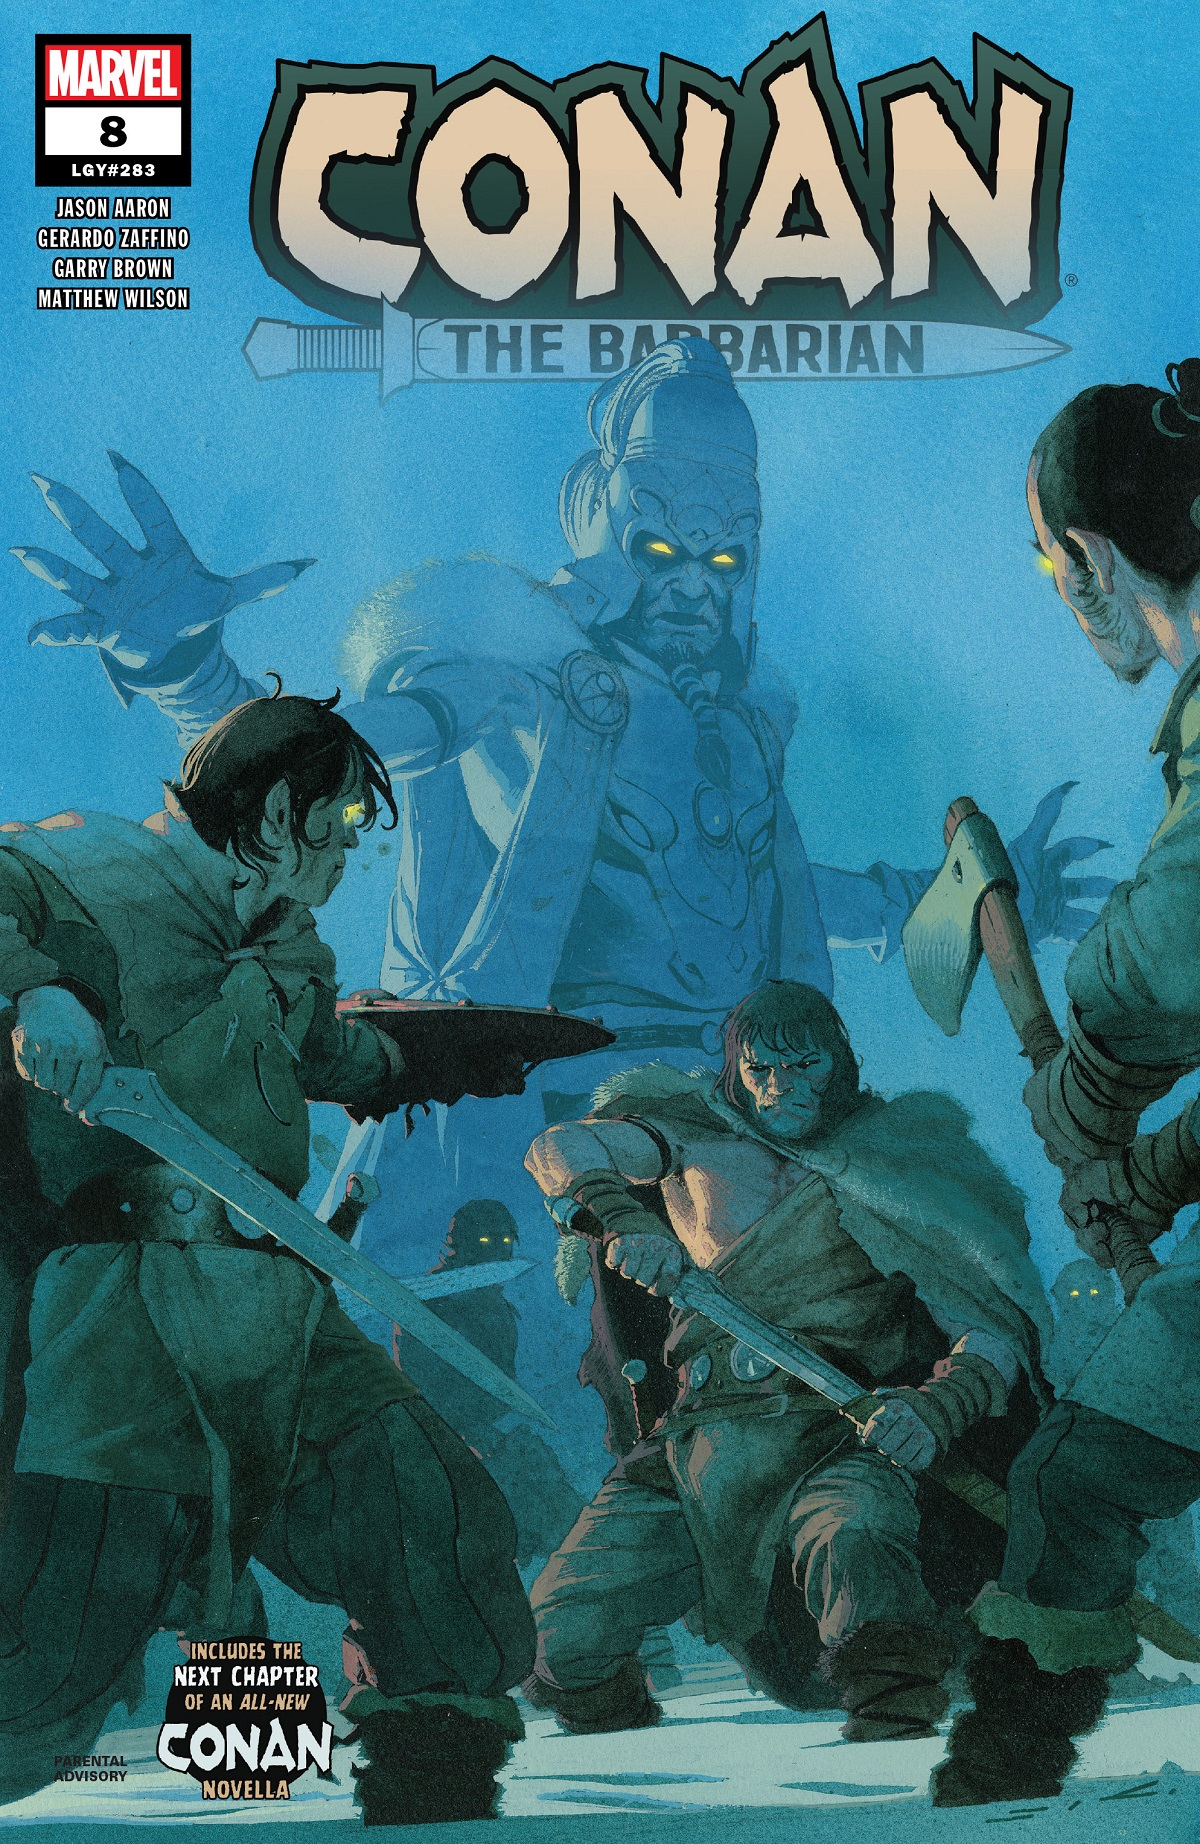 Conan the Barbarian (2019) #8